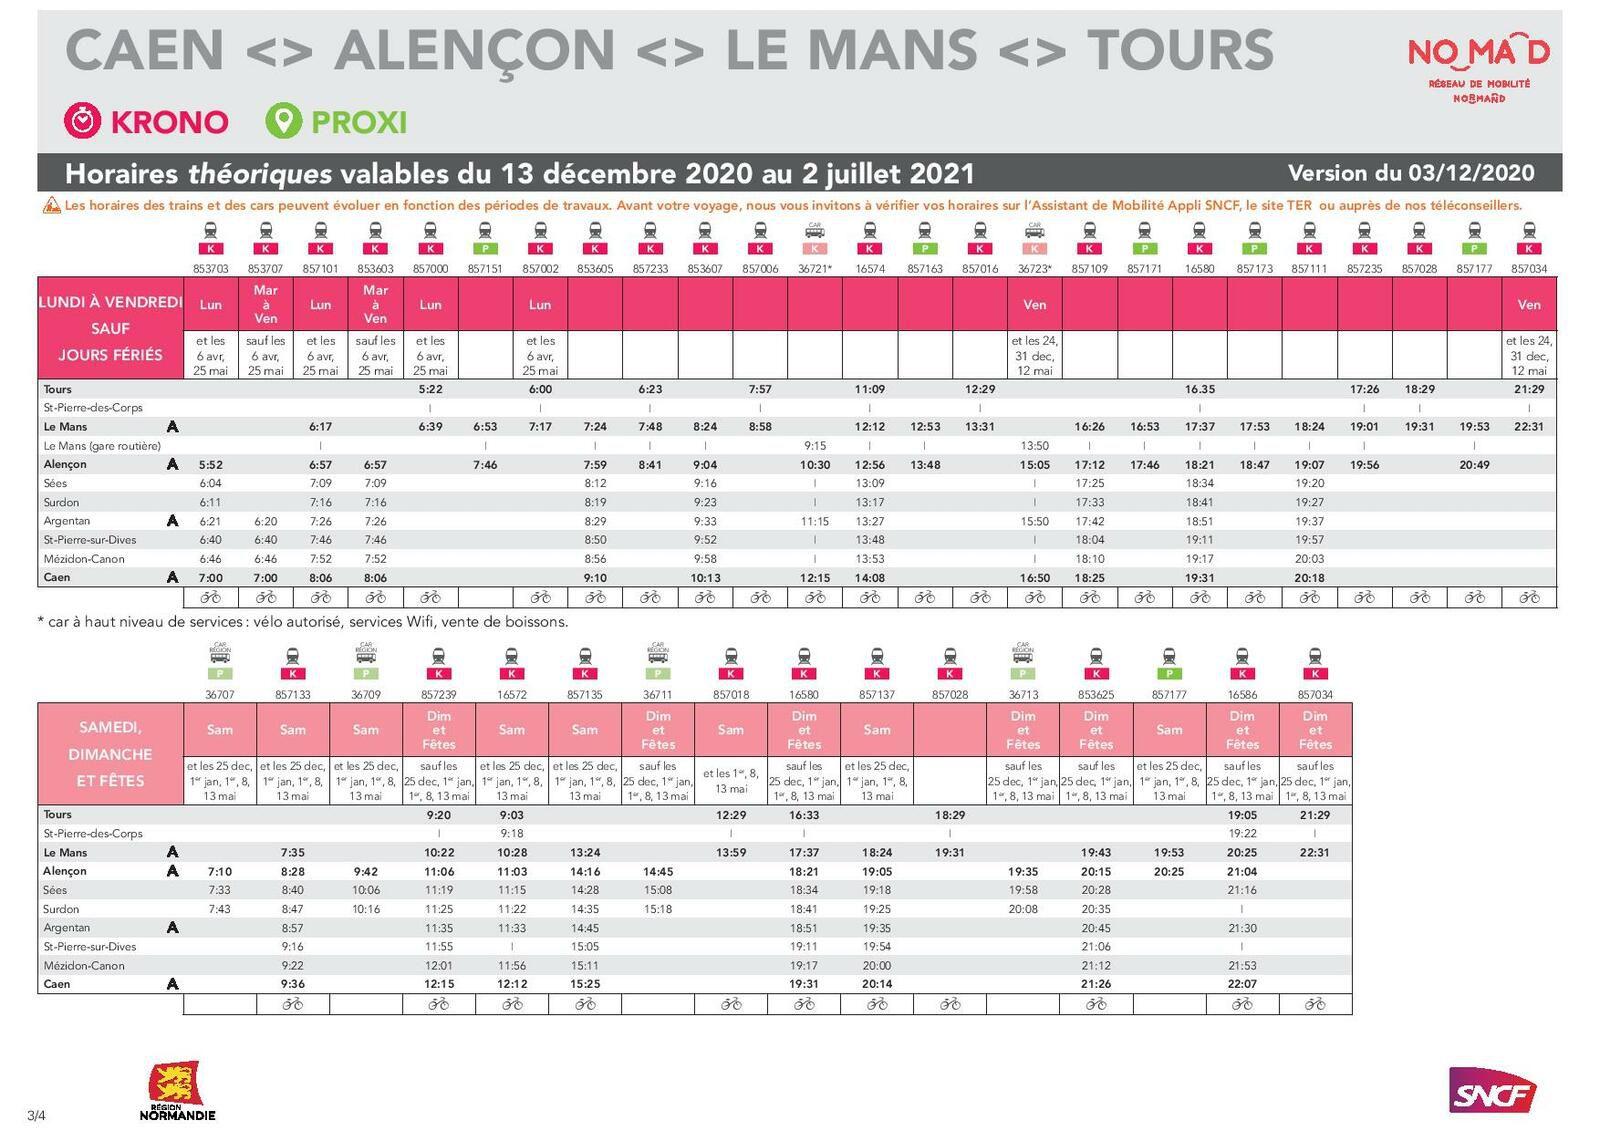 Tours > Caen